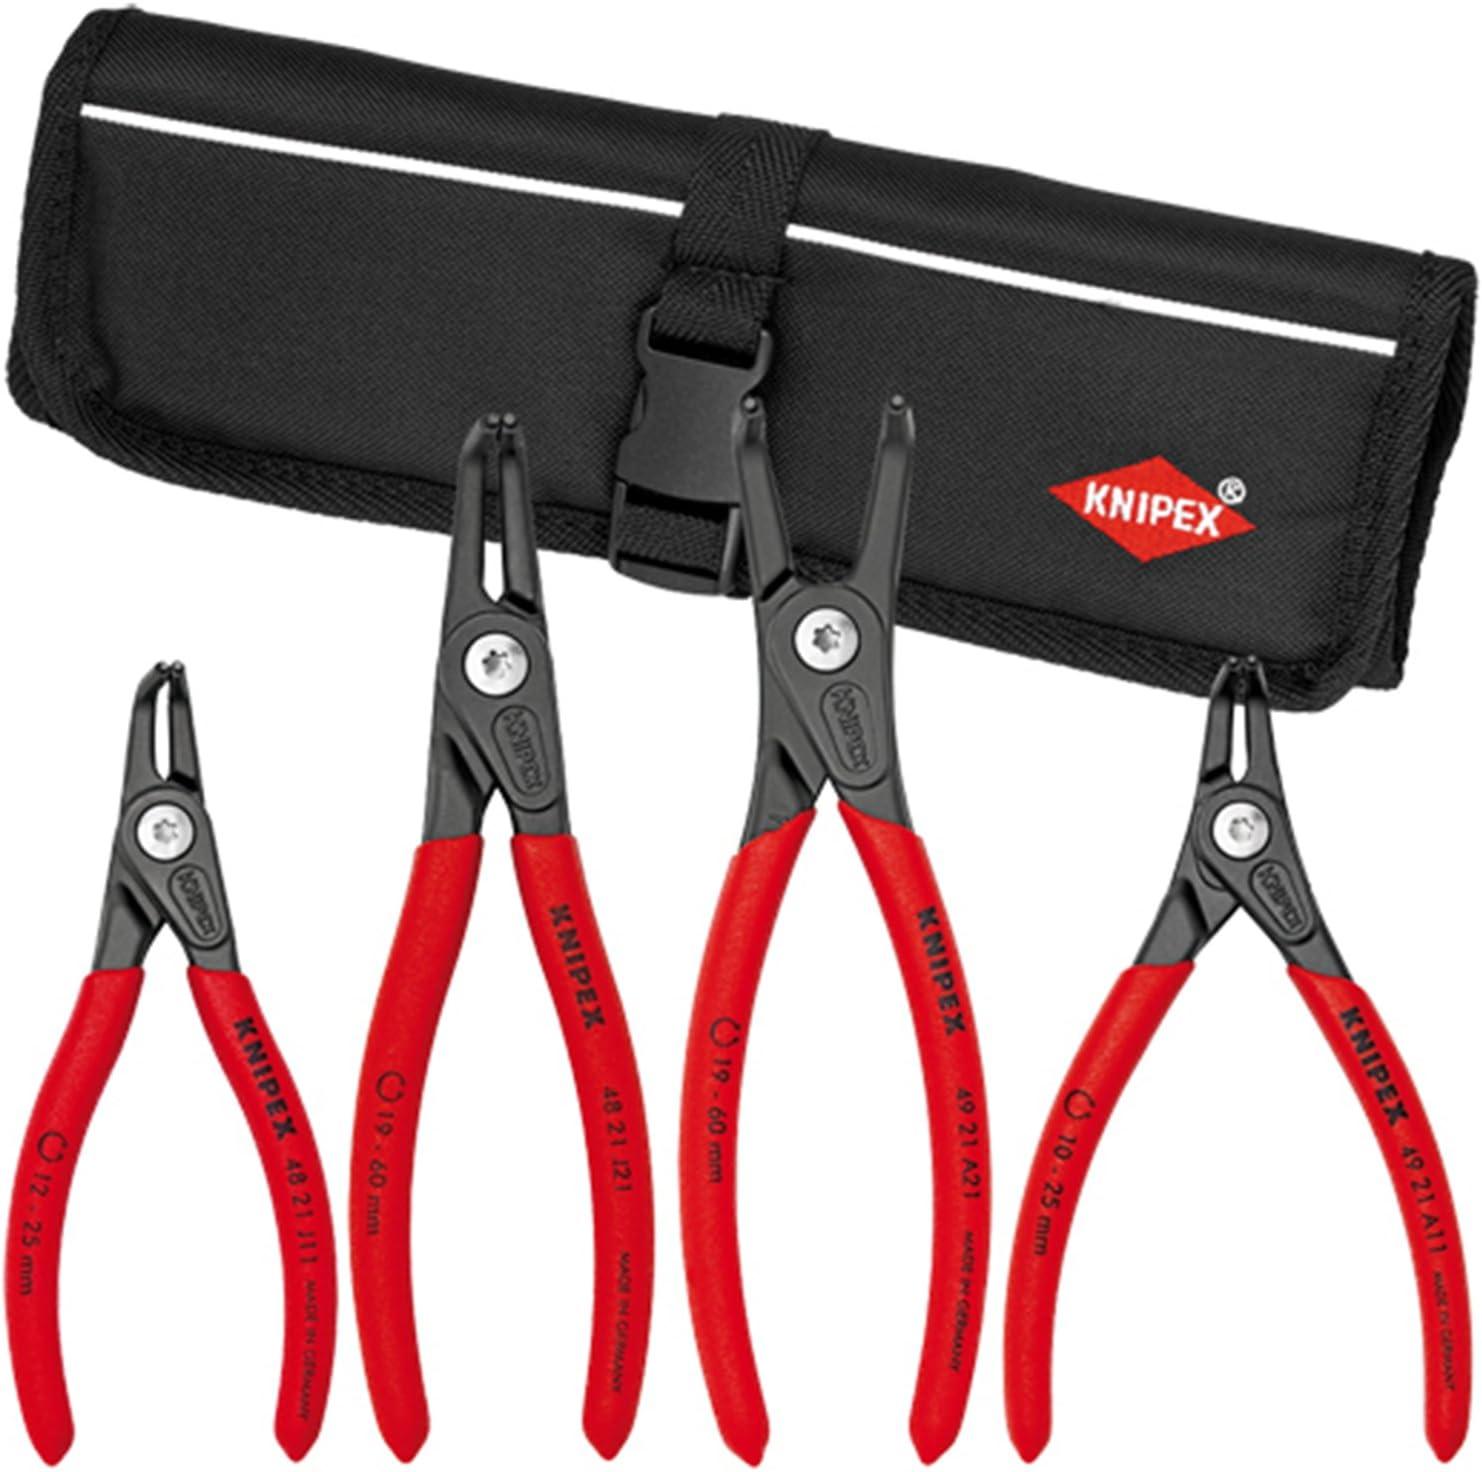 KNIPEX Tools - 4 Piece Pliers Precision Great interest Circlip Set 9K008020US Milwaukee Mall